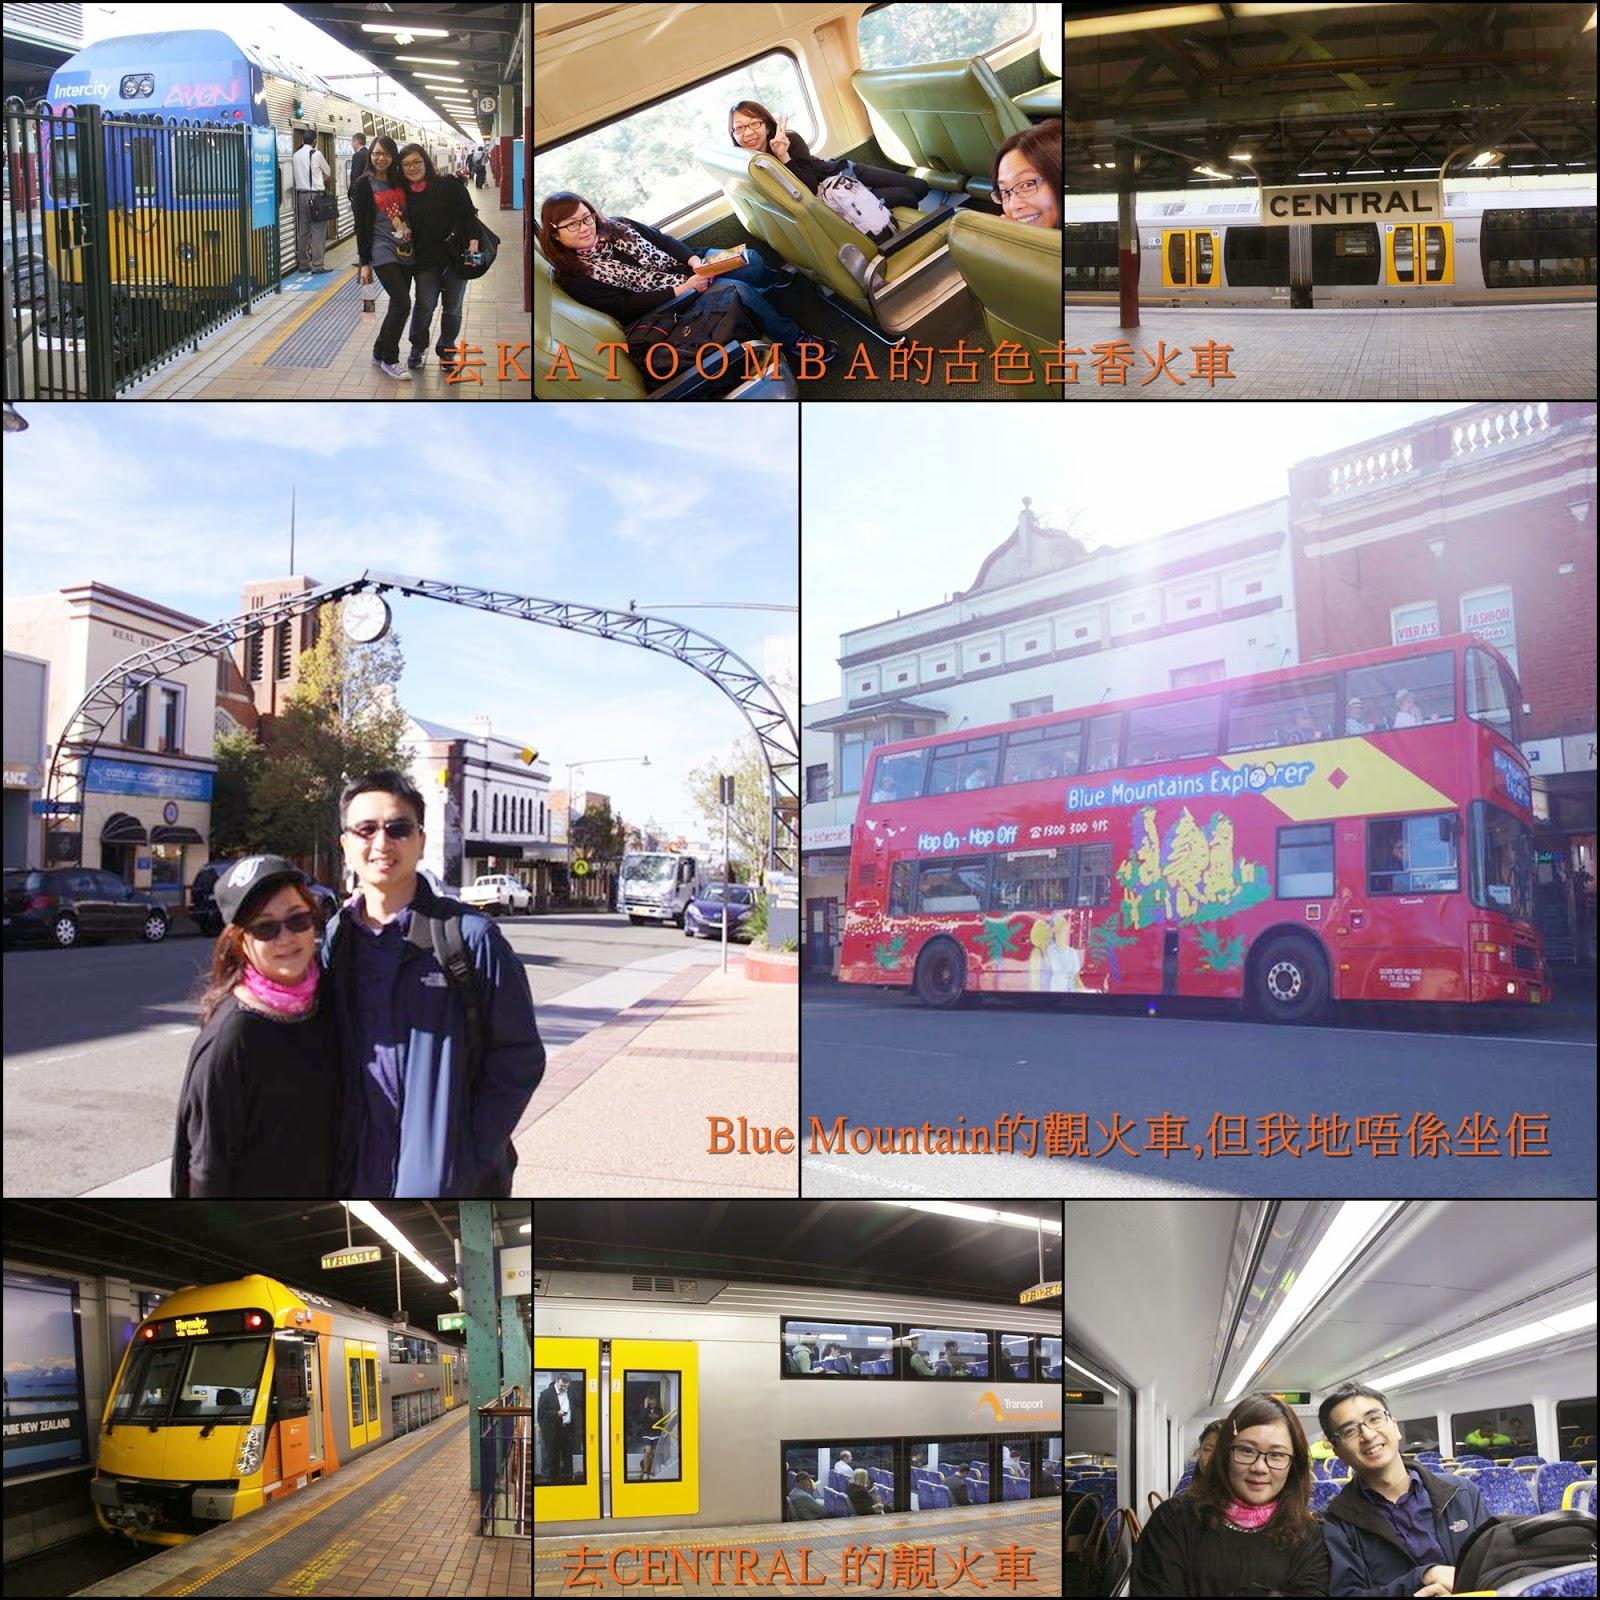 C&C 我們這一家 : Sydney day 4 : blue mountain + Leuran Village + 遊船河 (Part 1)